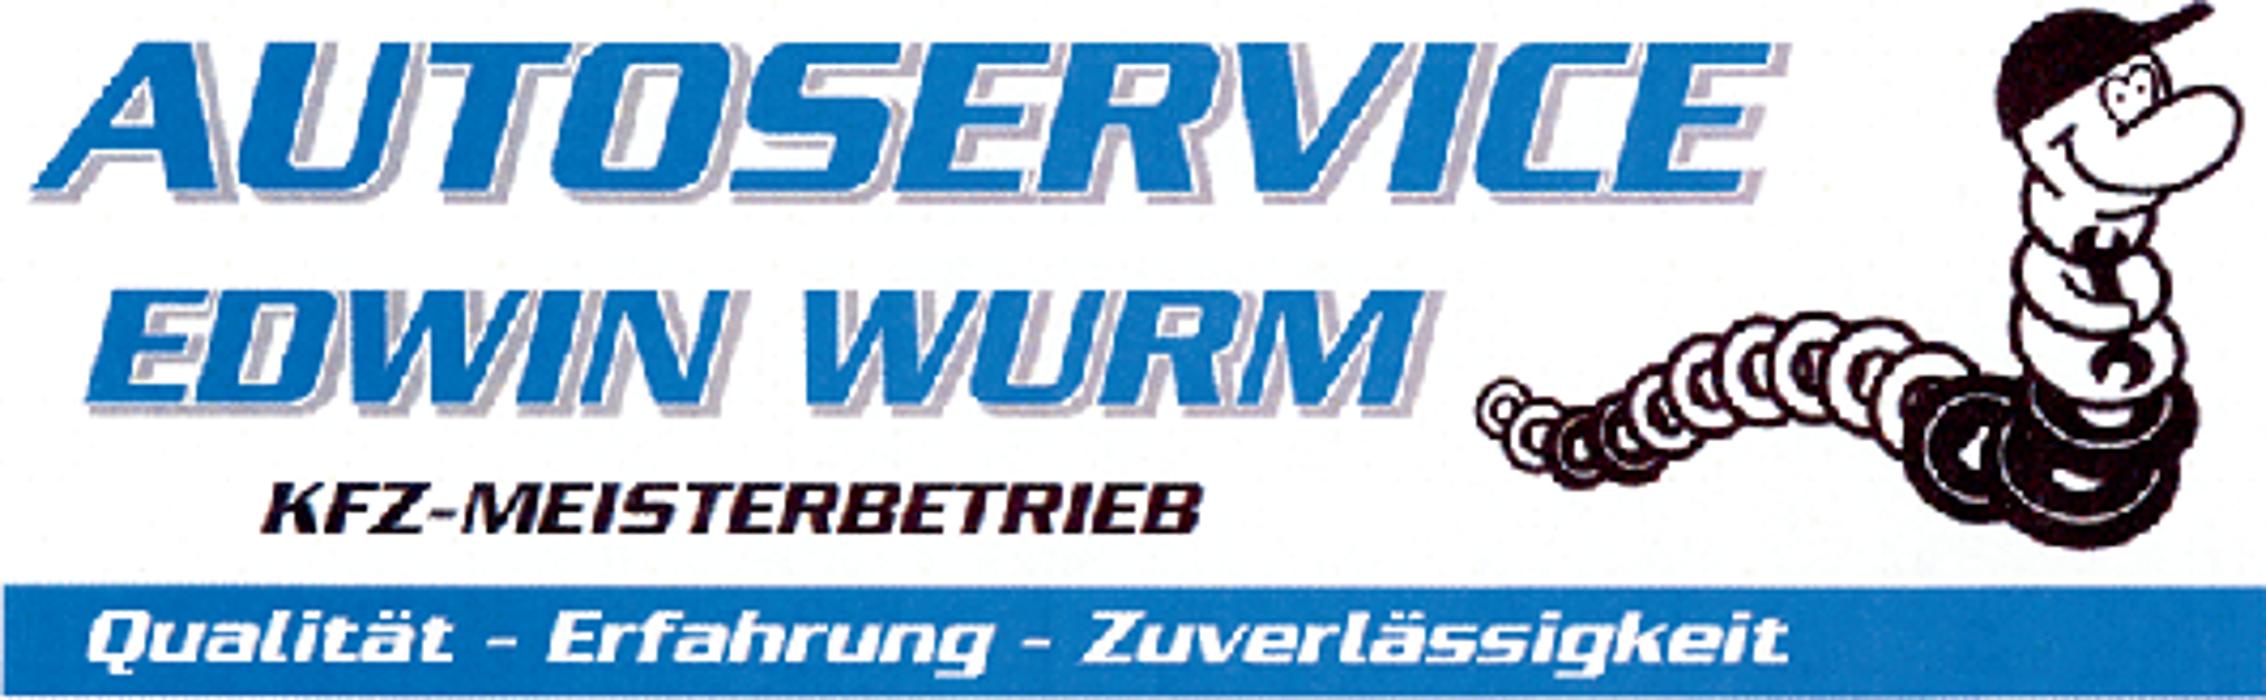 Bild zu Autoservice Wurm, Edwin Wurm in Waltenhofen